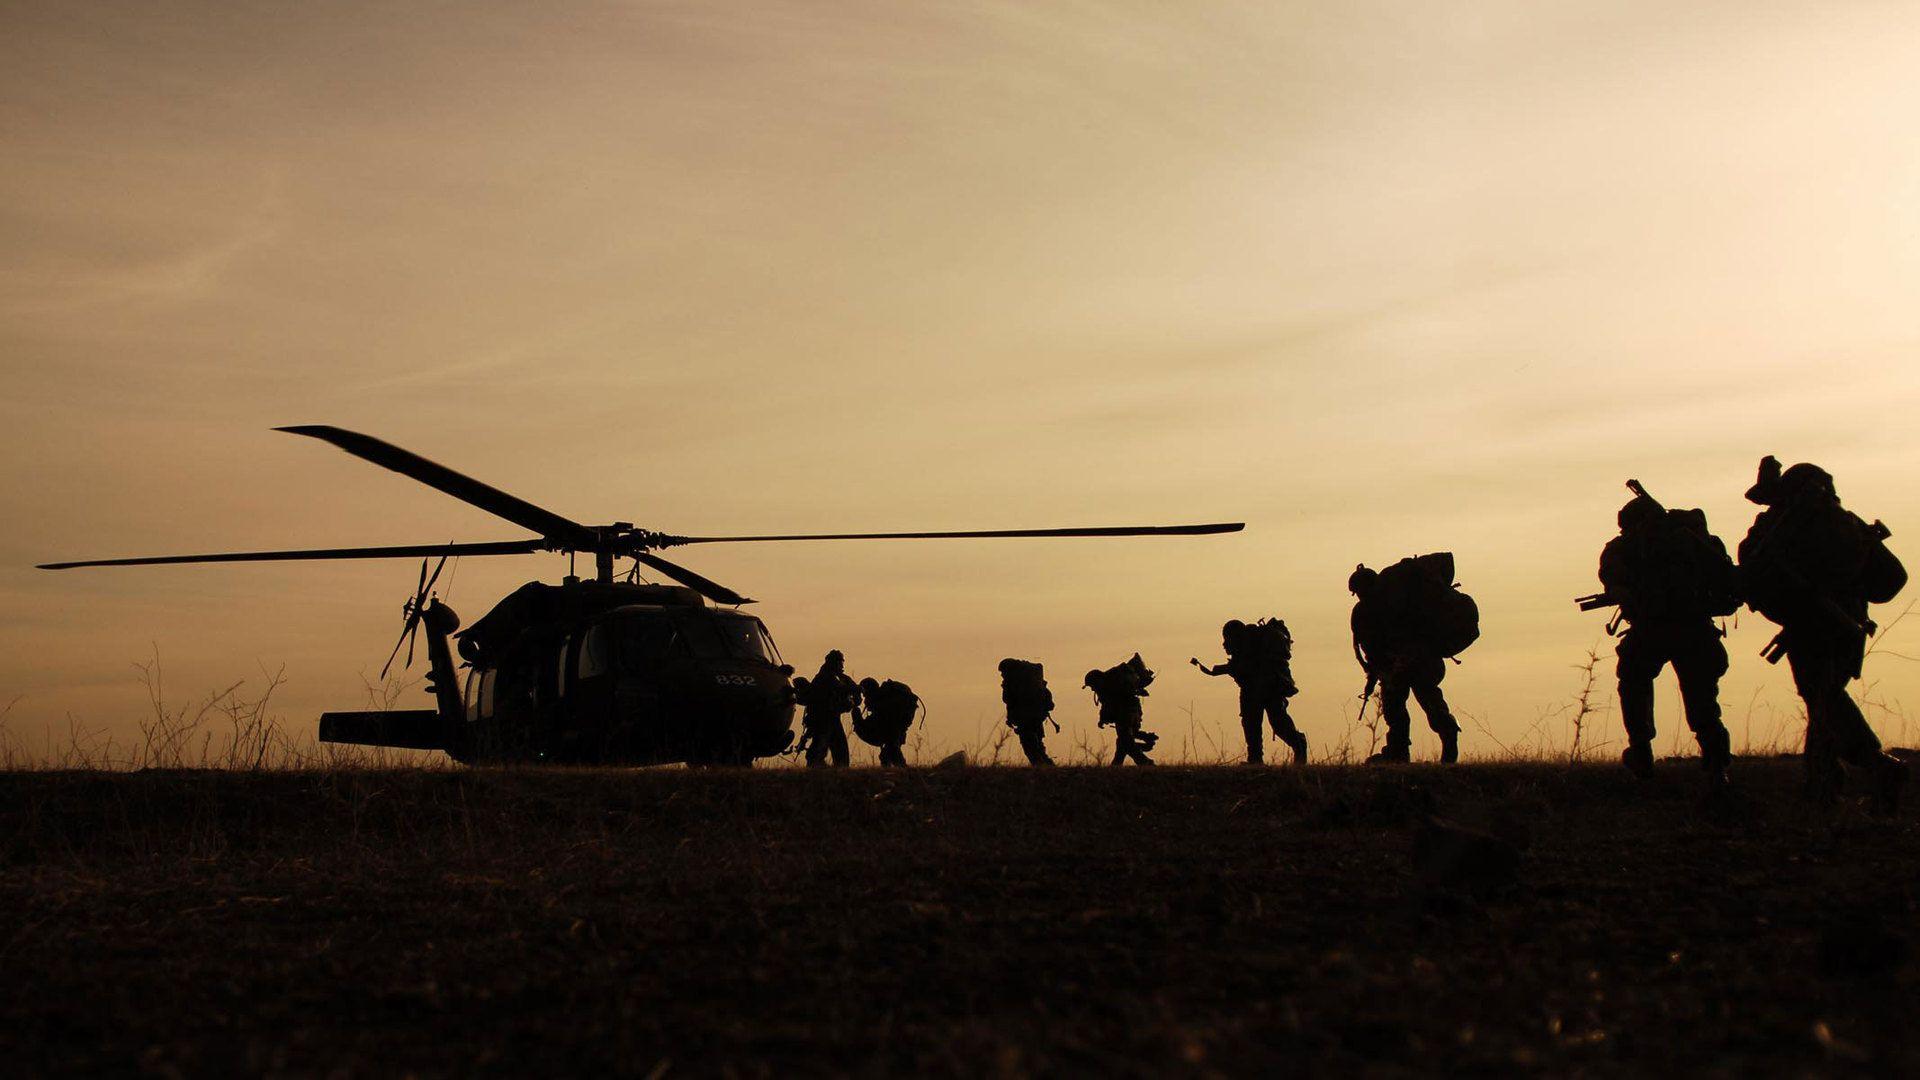 Http Www Hdwallpapersdesktop Com Military Night Hawk Night 20hawk 20wallpaper 20hd 20helicopter 20mili Military Wallpaper Army Wallpaper Military Soldiers